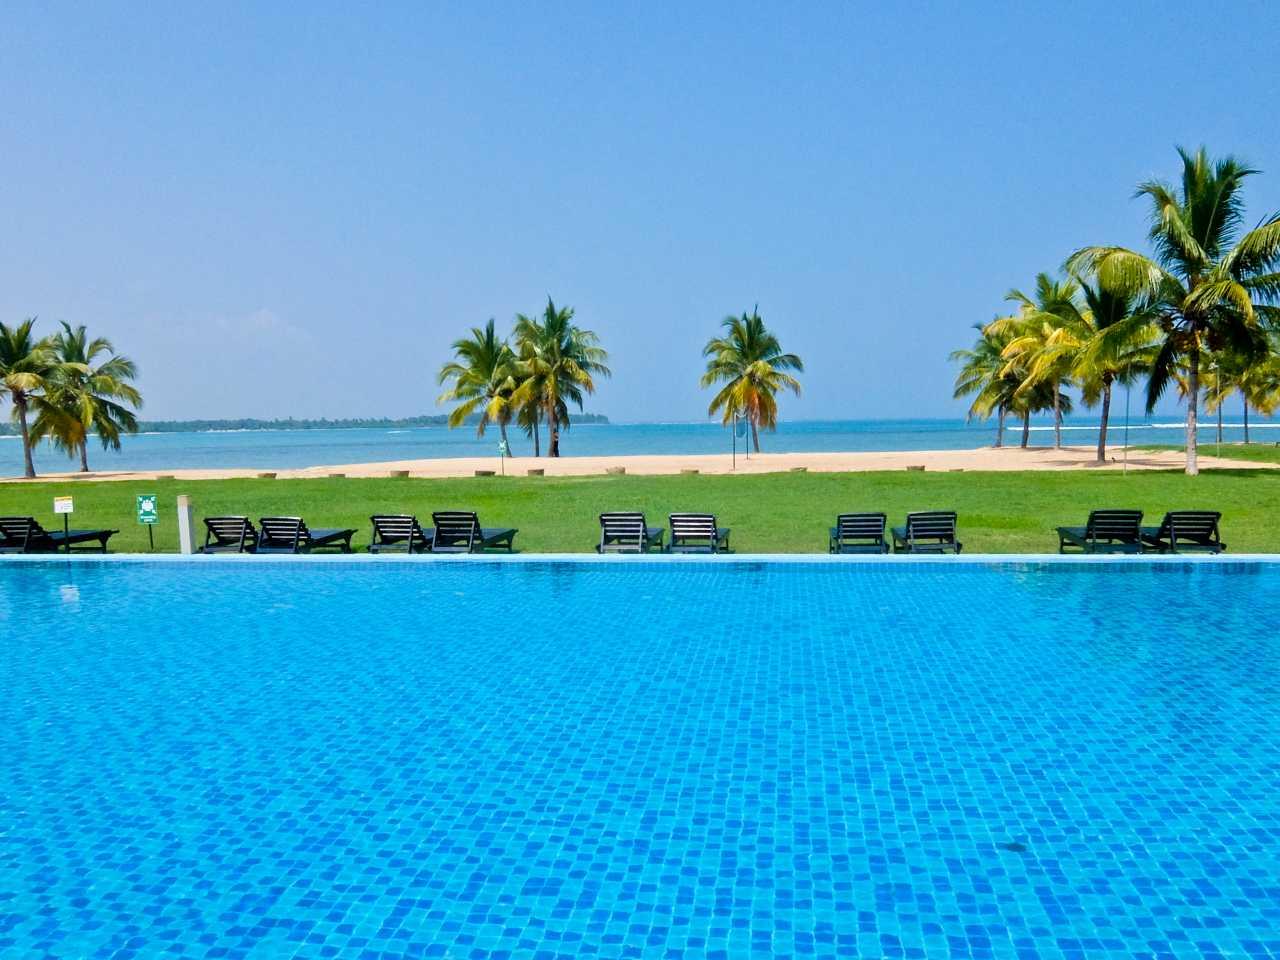 Sri Lanka road trip - Amaya Beach Passikudah